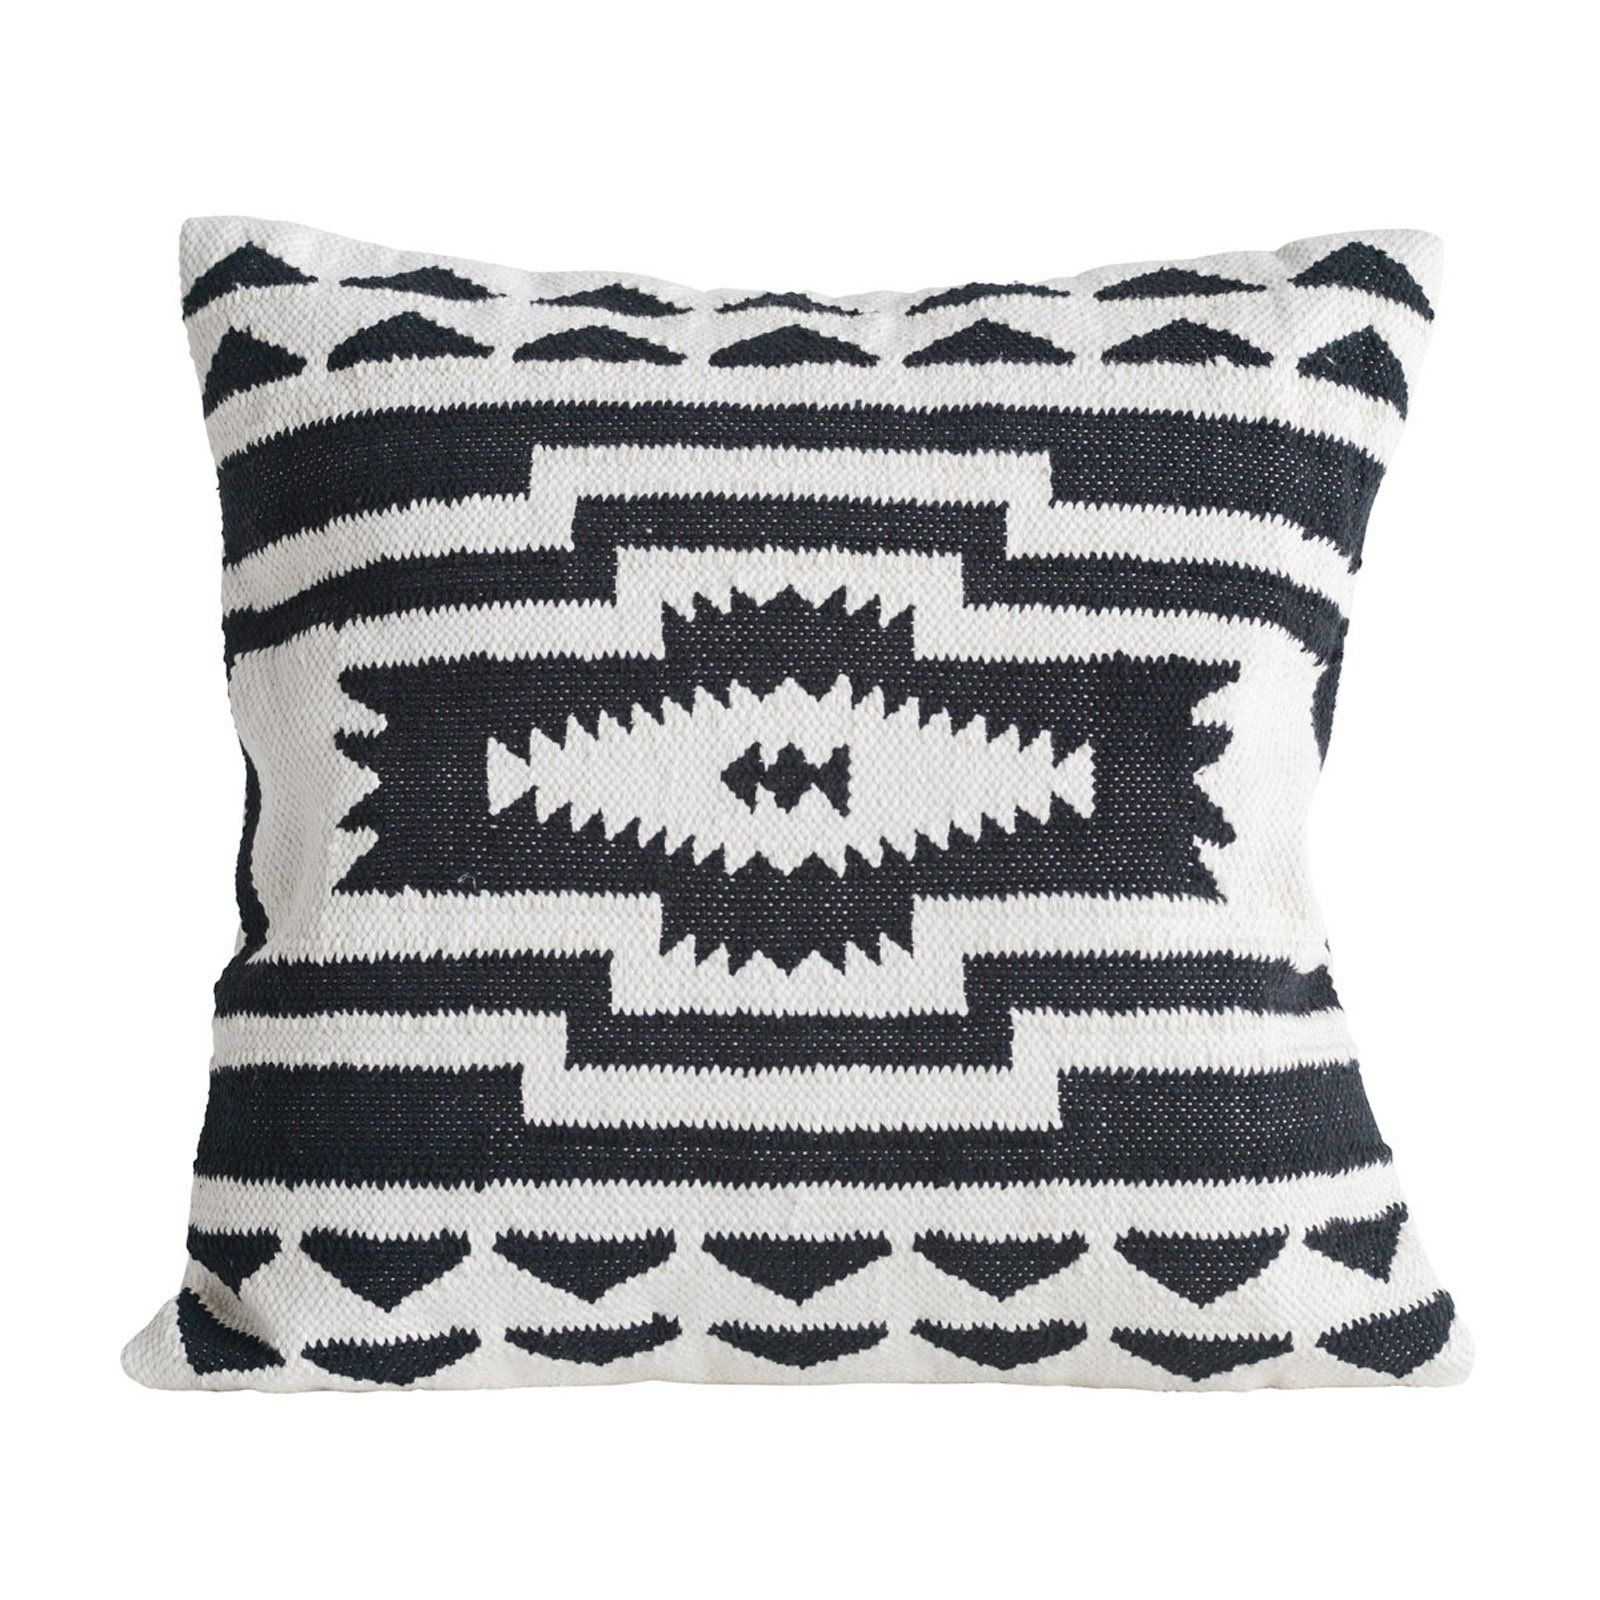 Home Throw Pillows Cotton Throw Pillow